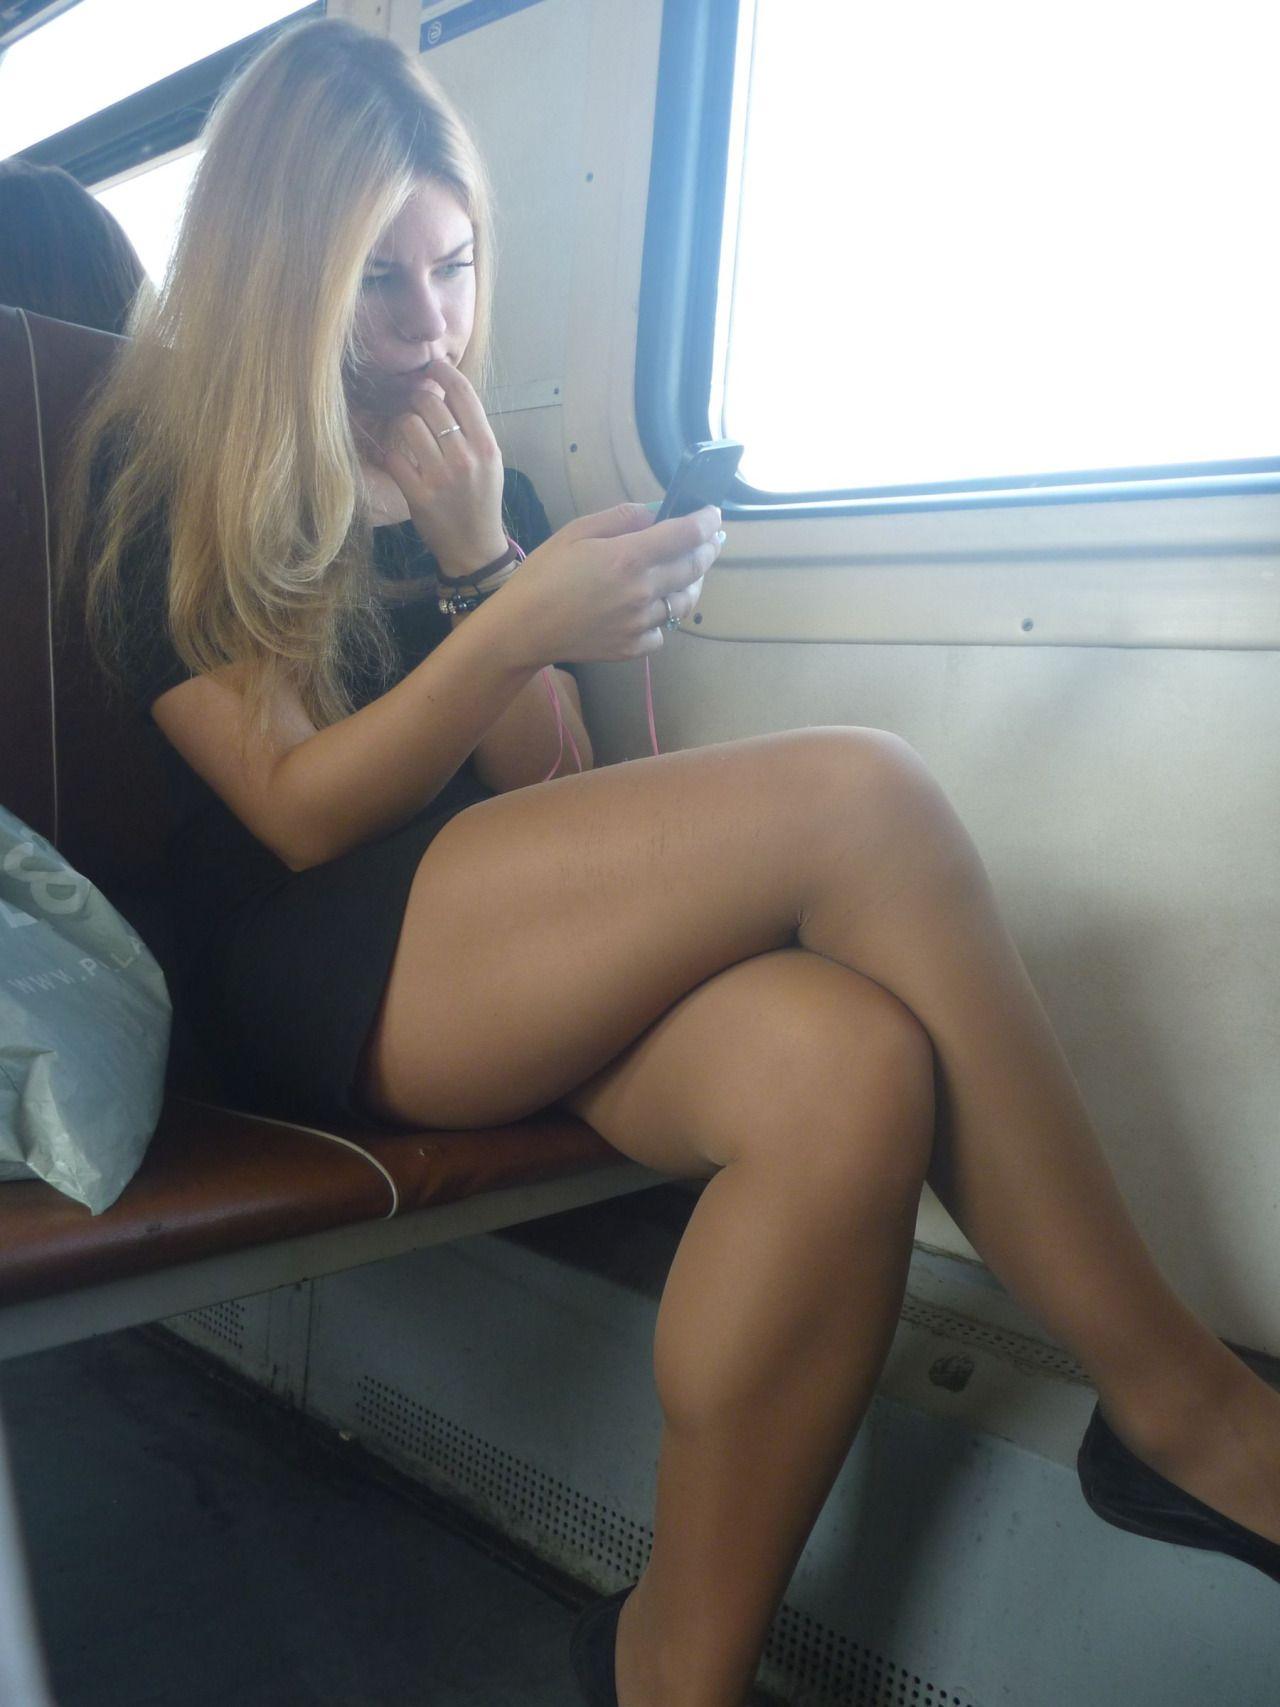 фото девушек в юбке без трусов